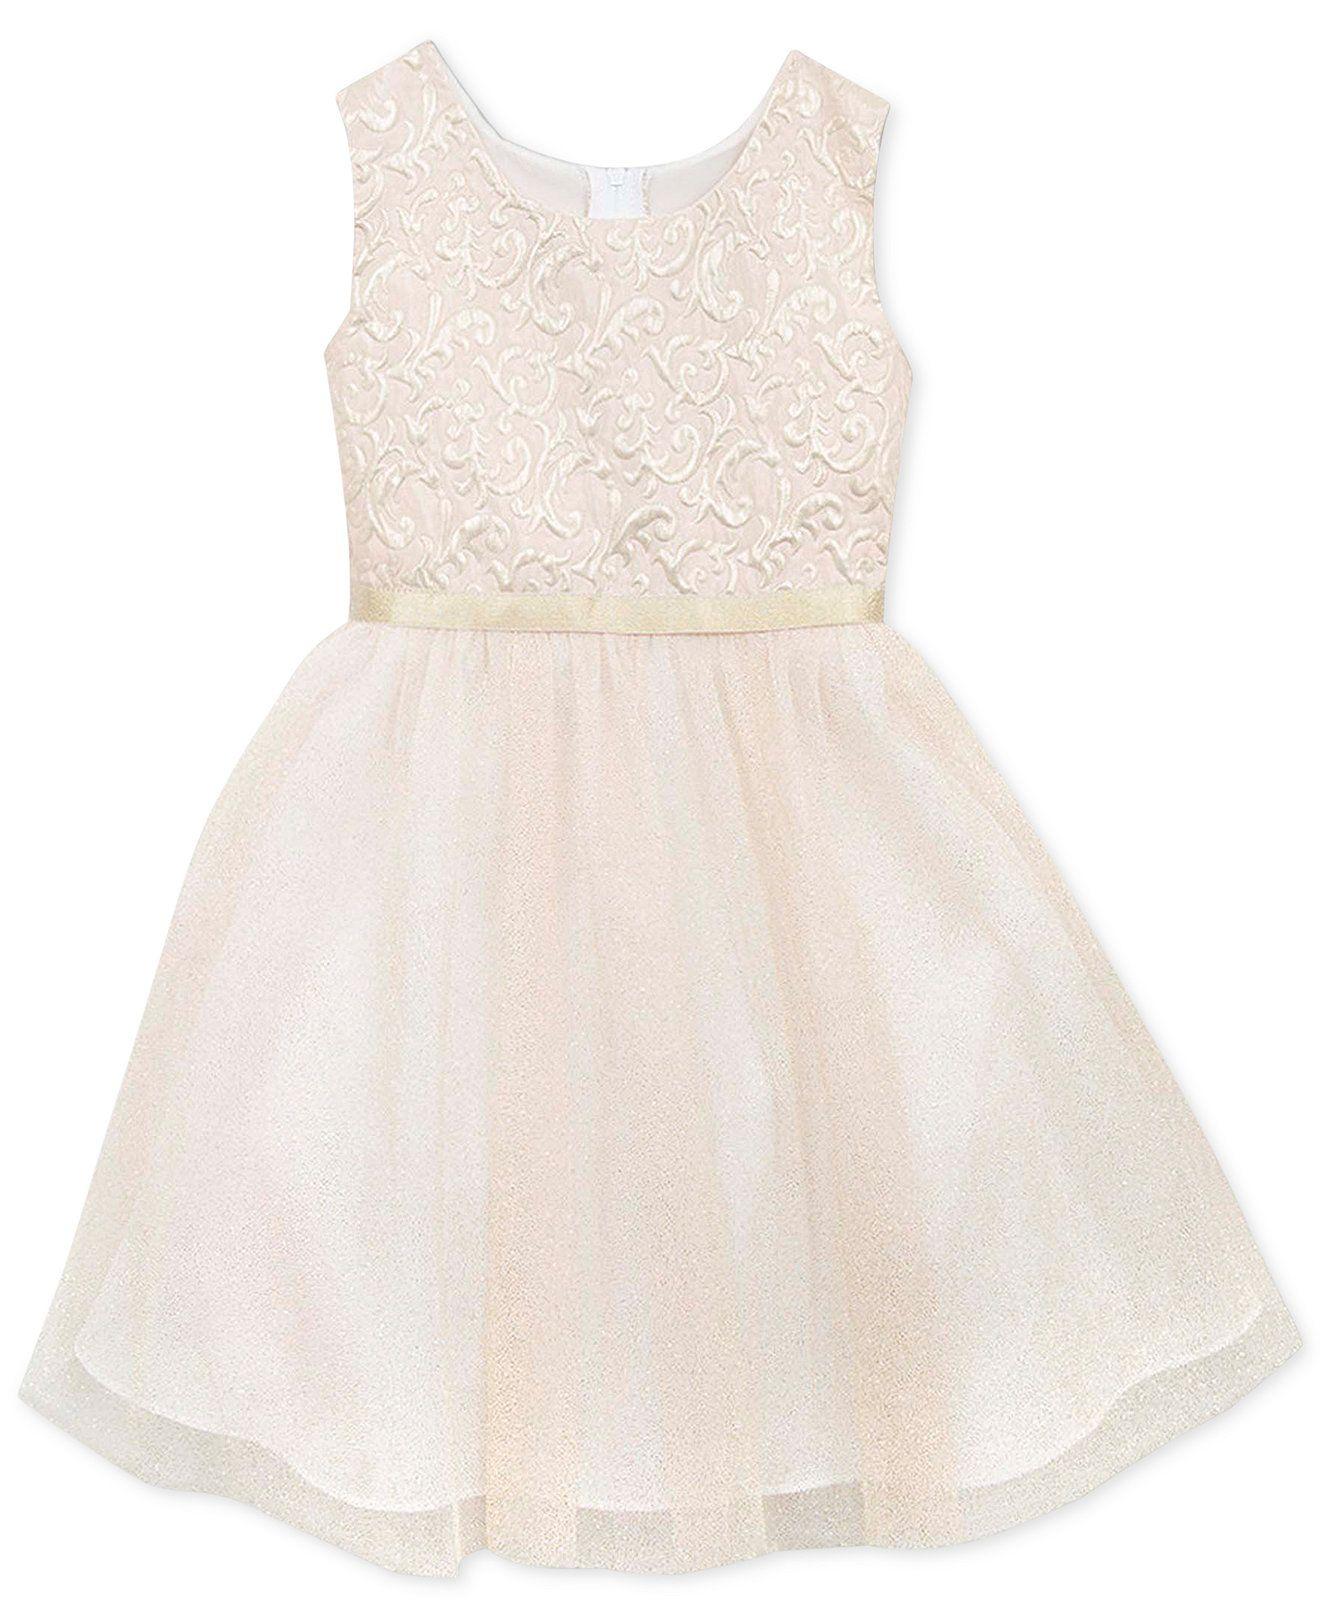 f9ca233d3826 Baby Girl Special Occasion Dresses Macys | Saddha